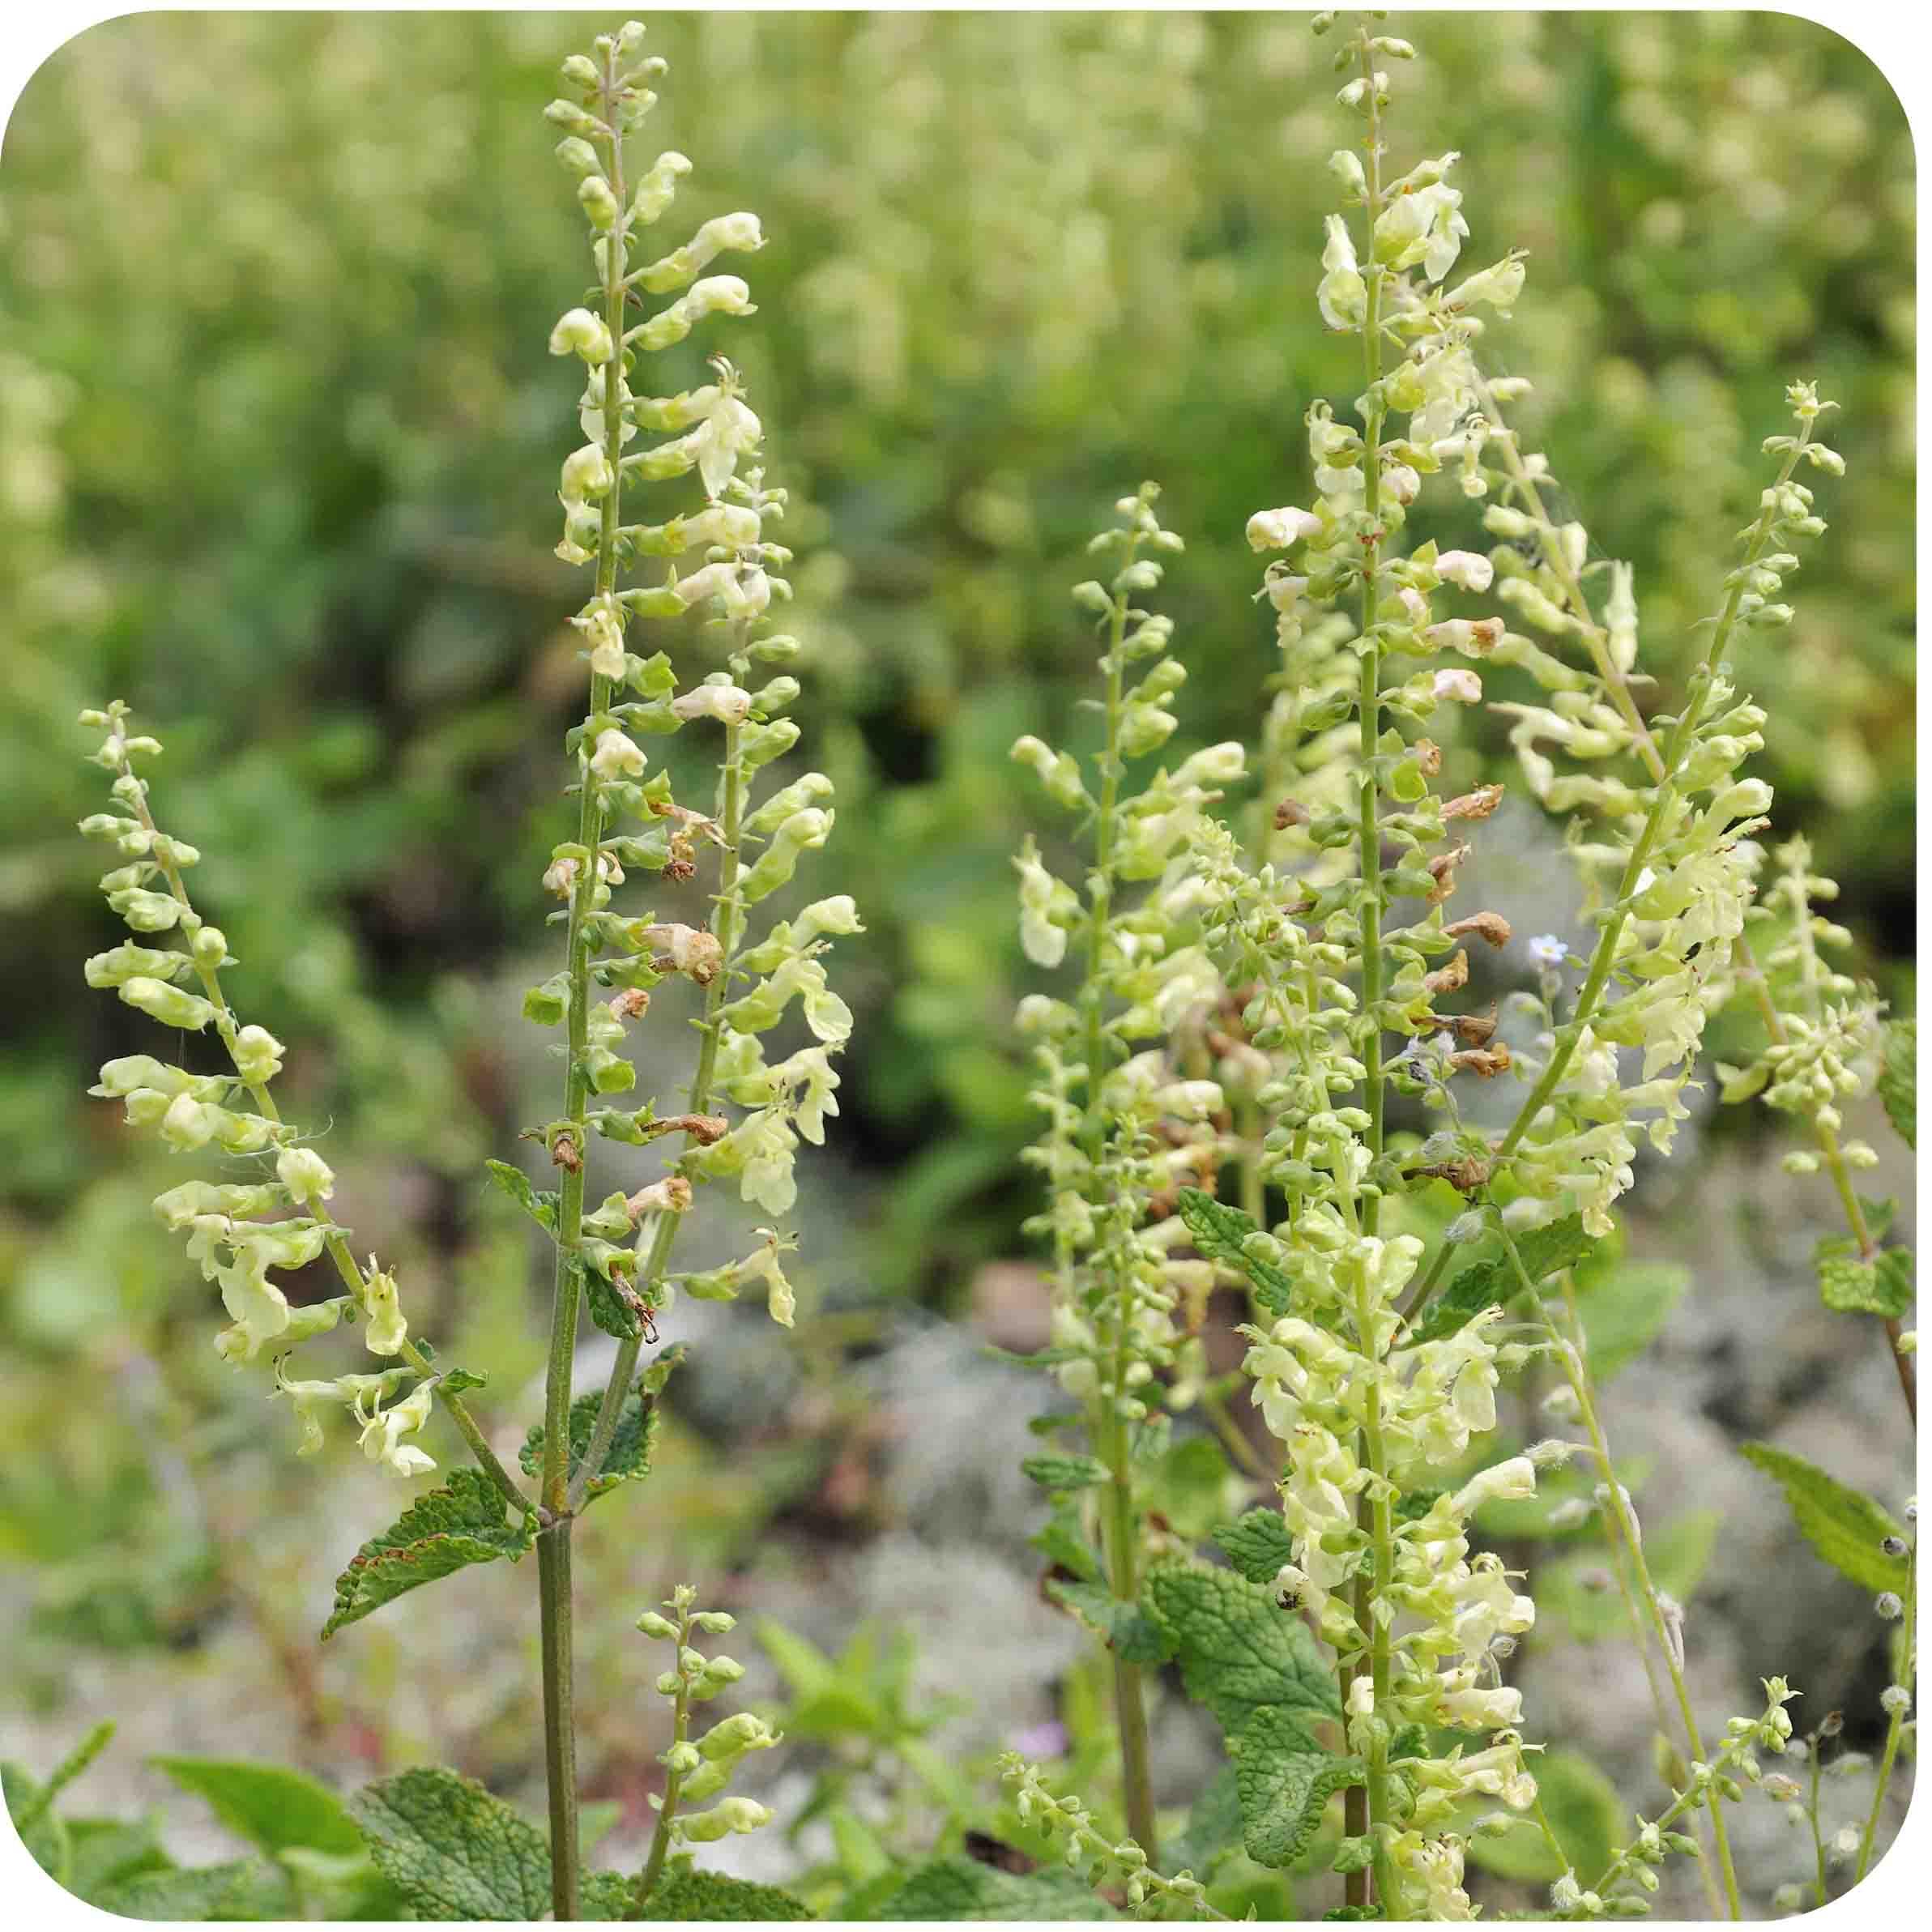 Wood Sage (Teucrium scorodonia) plug plants